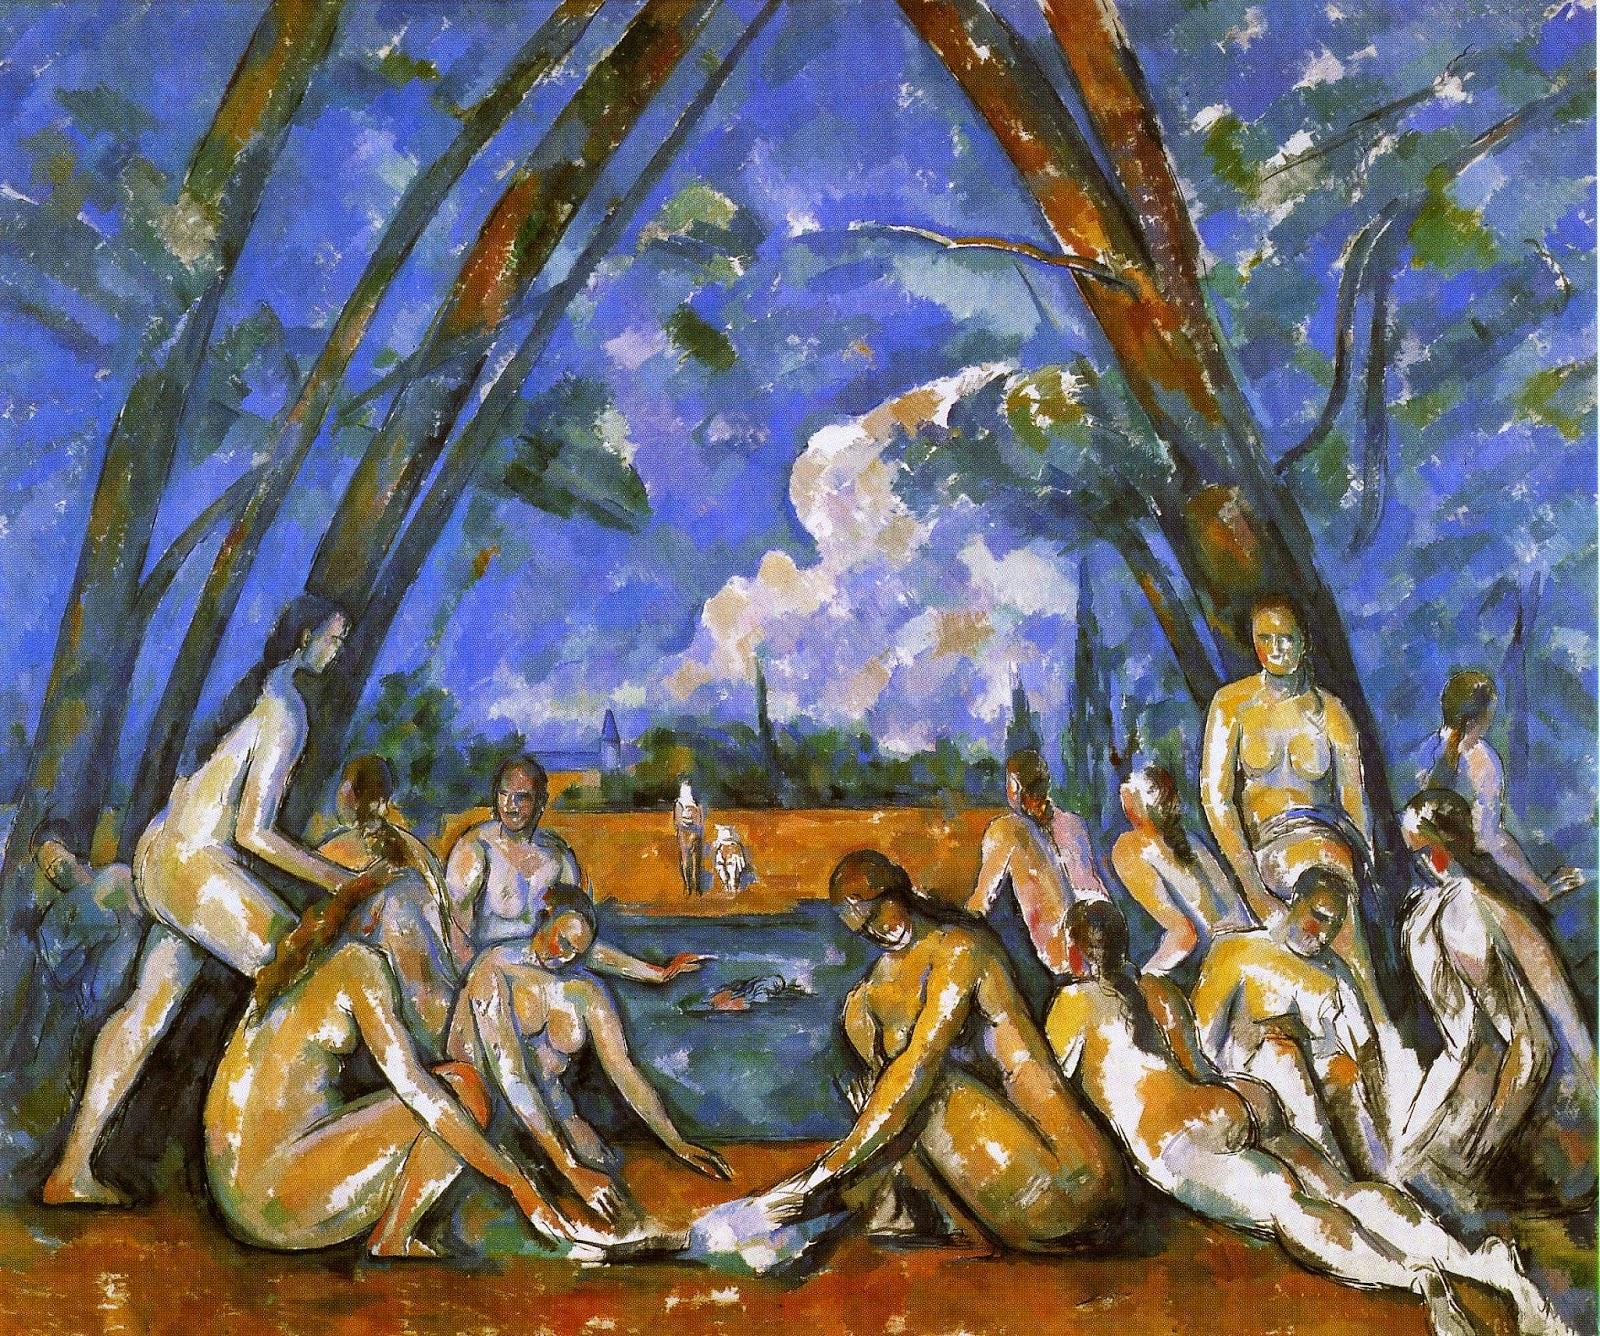 Modern Art With Professor Blanchard: Post Impressionism